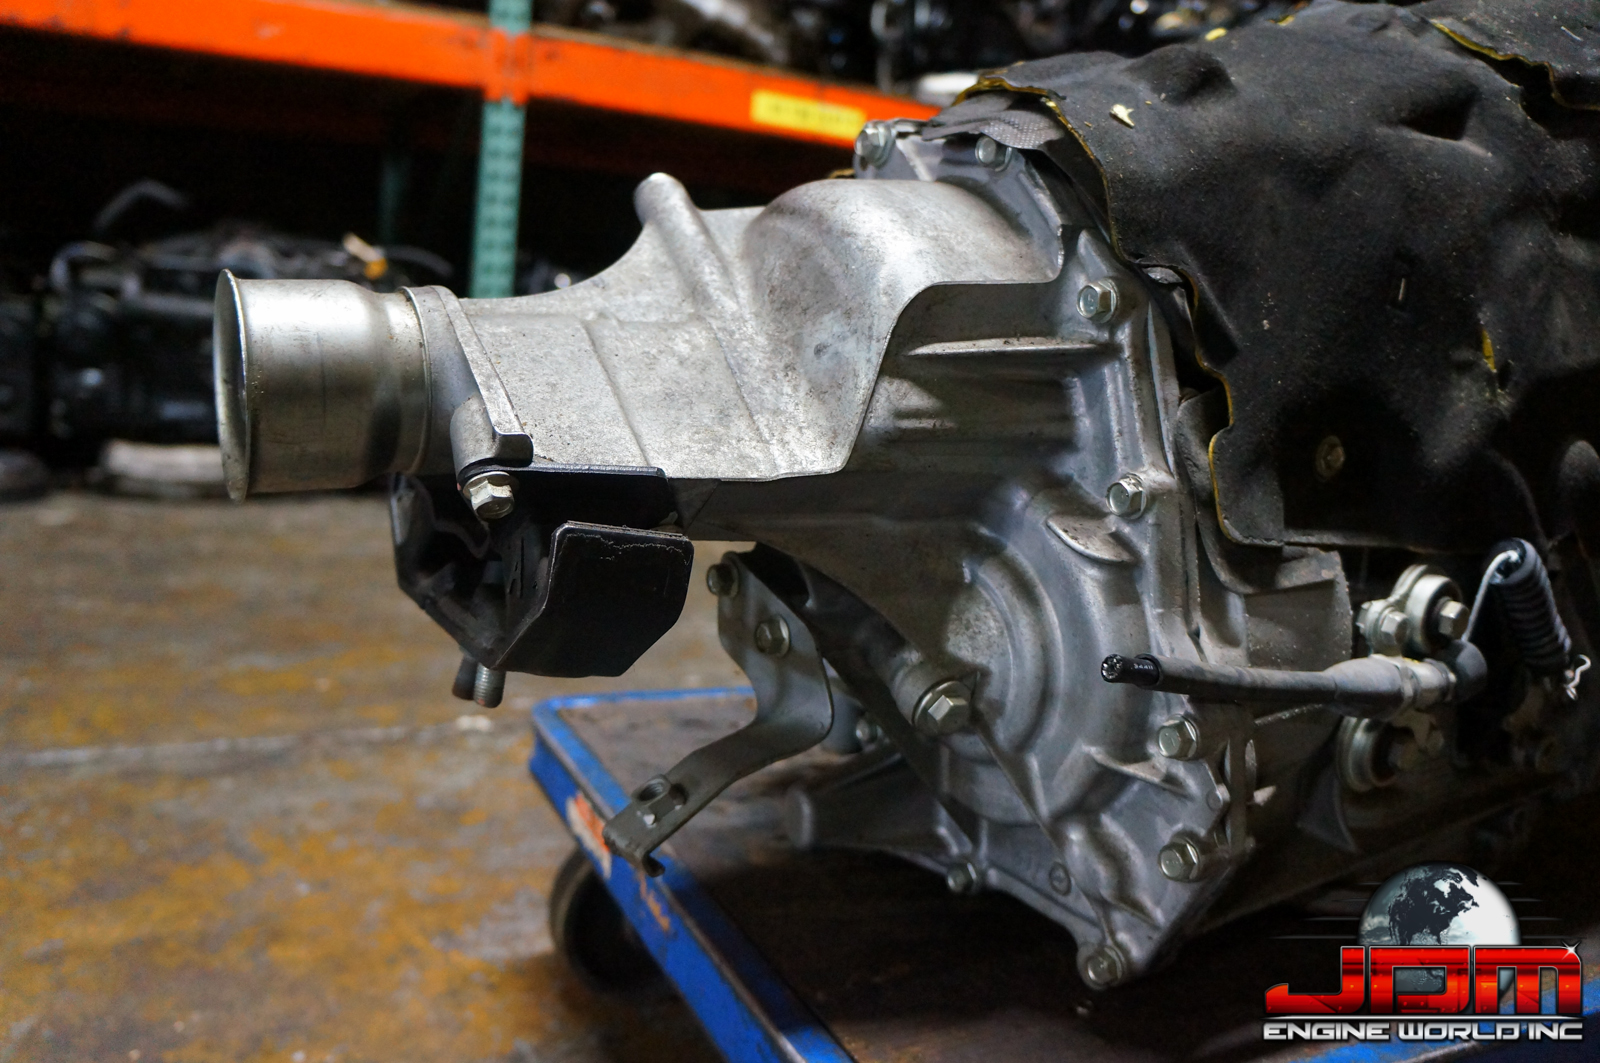 2014 SUBARU EXIGA 2.5L DOHC AUTOMATIC TRANSMISSION JDM FB25